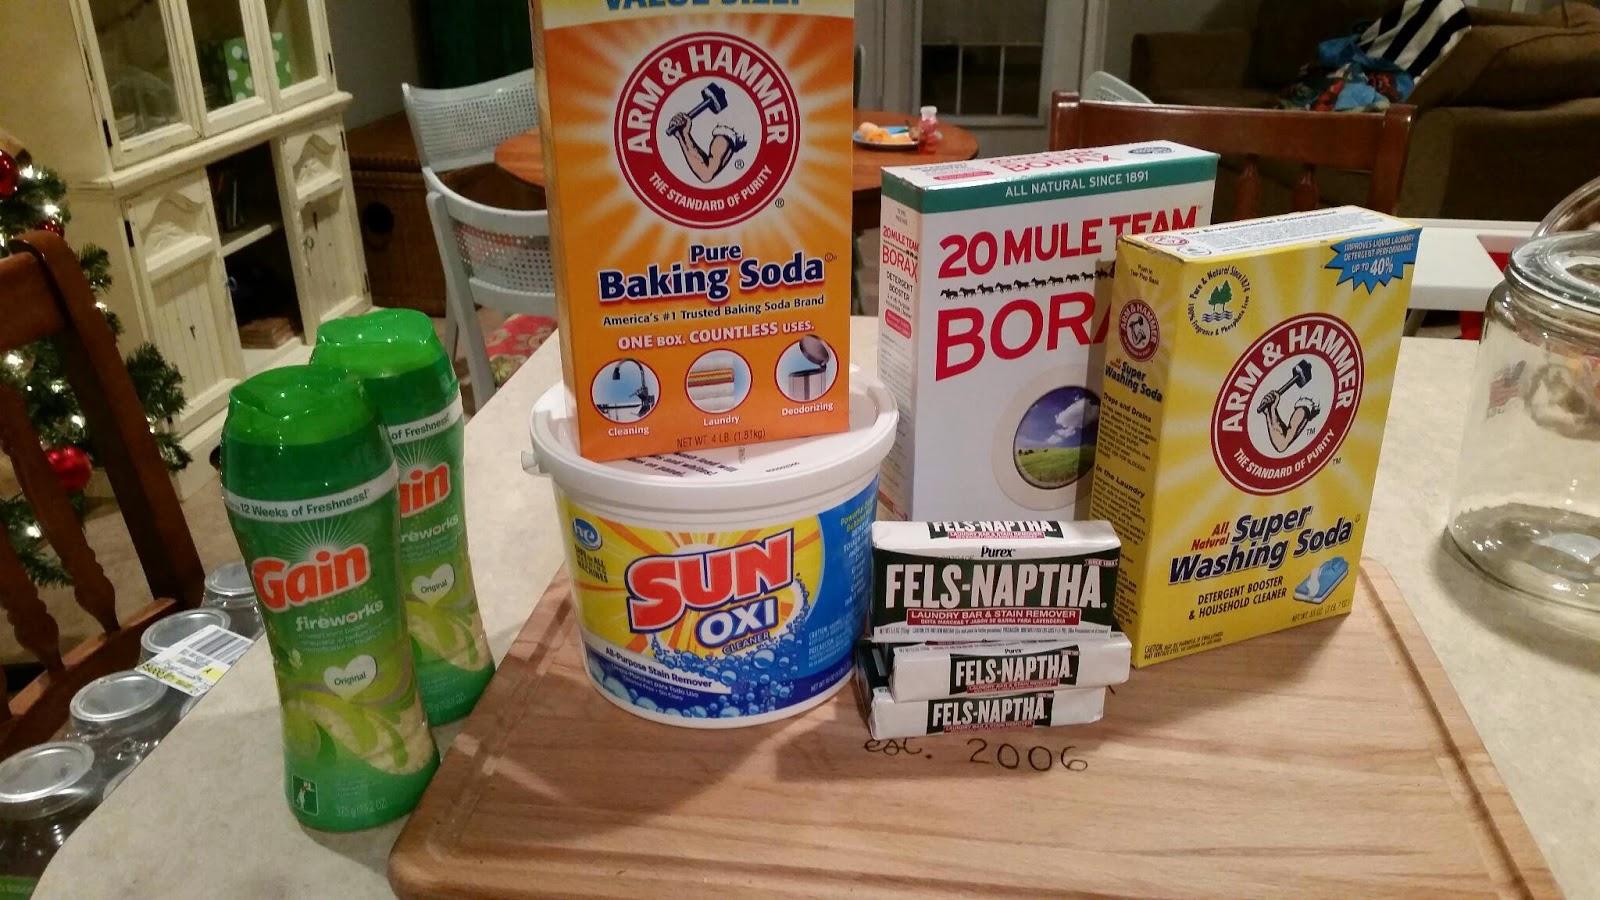 baking soda case